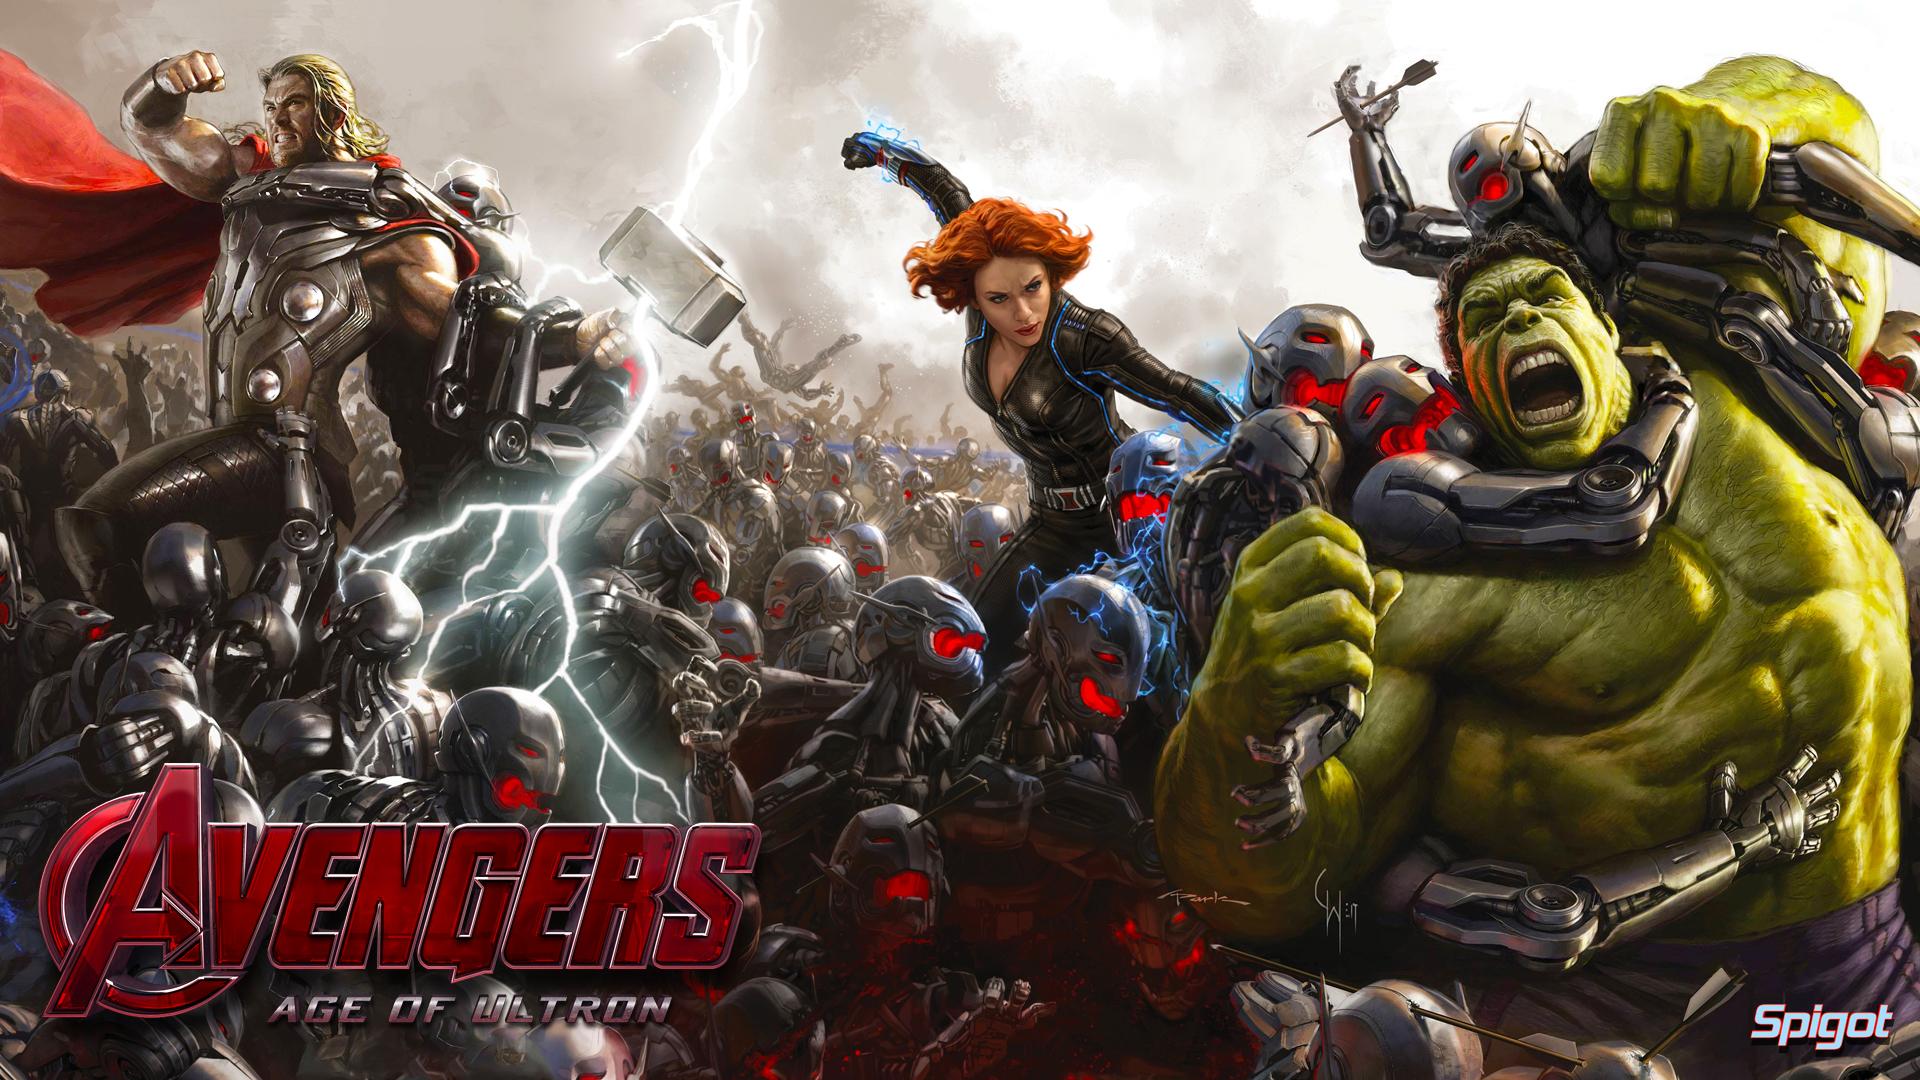 Avengers Age of Ultron George Spigots Blog 1920x1080